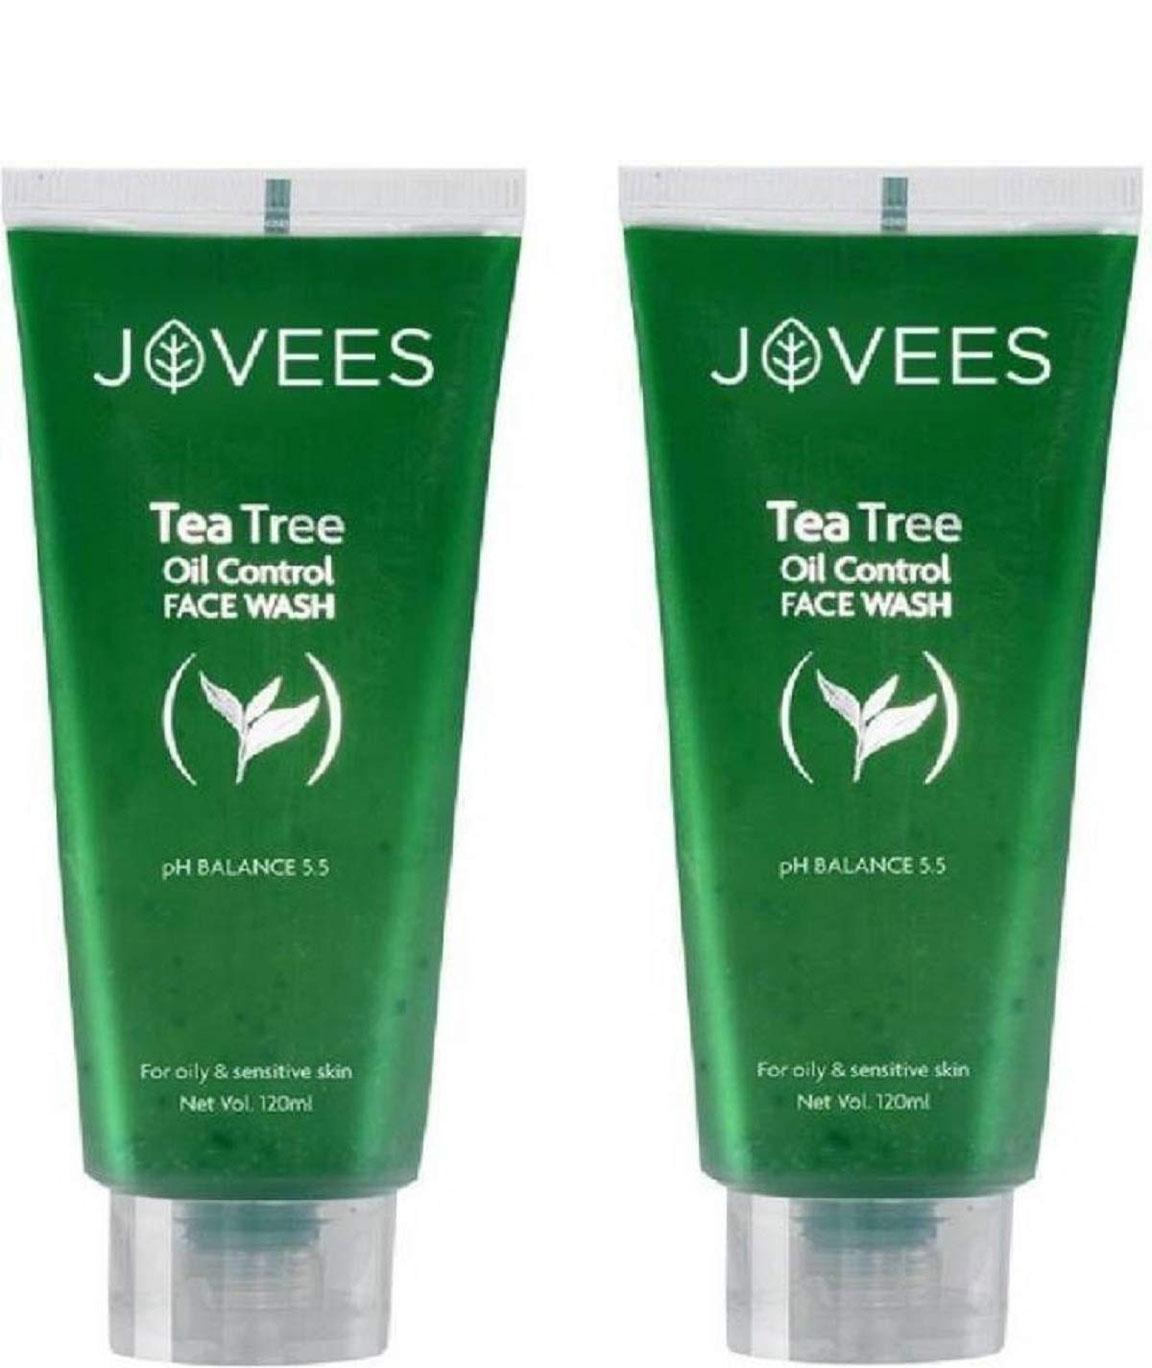 Jovees Tea Tree Oil Control Face Wash (240 ml)